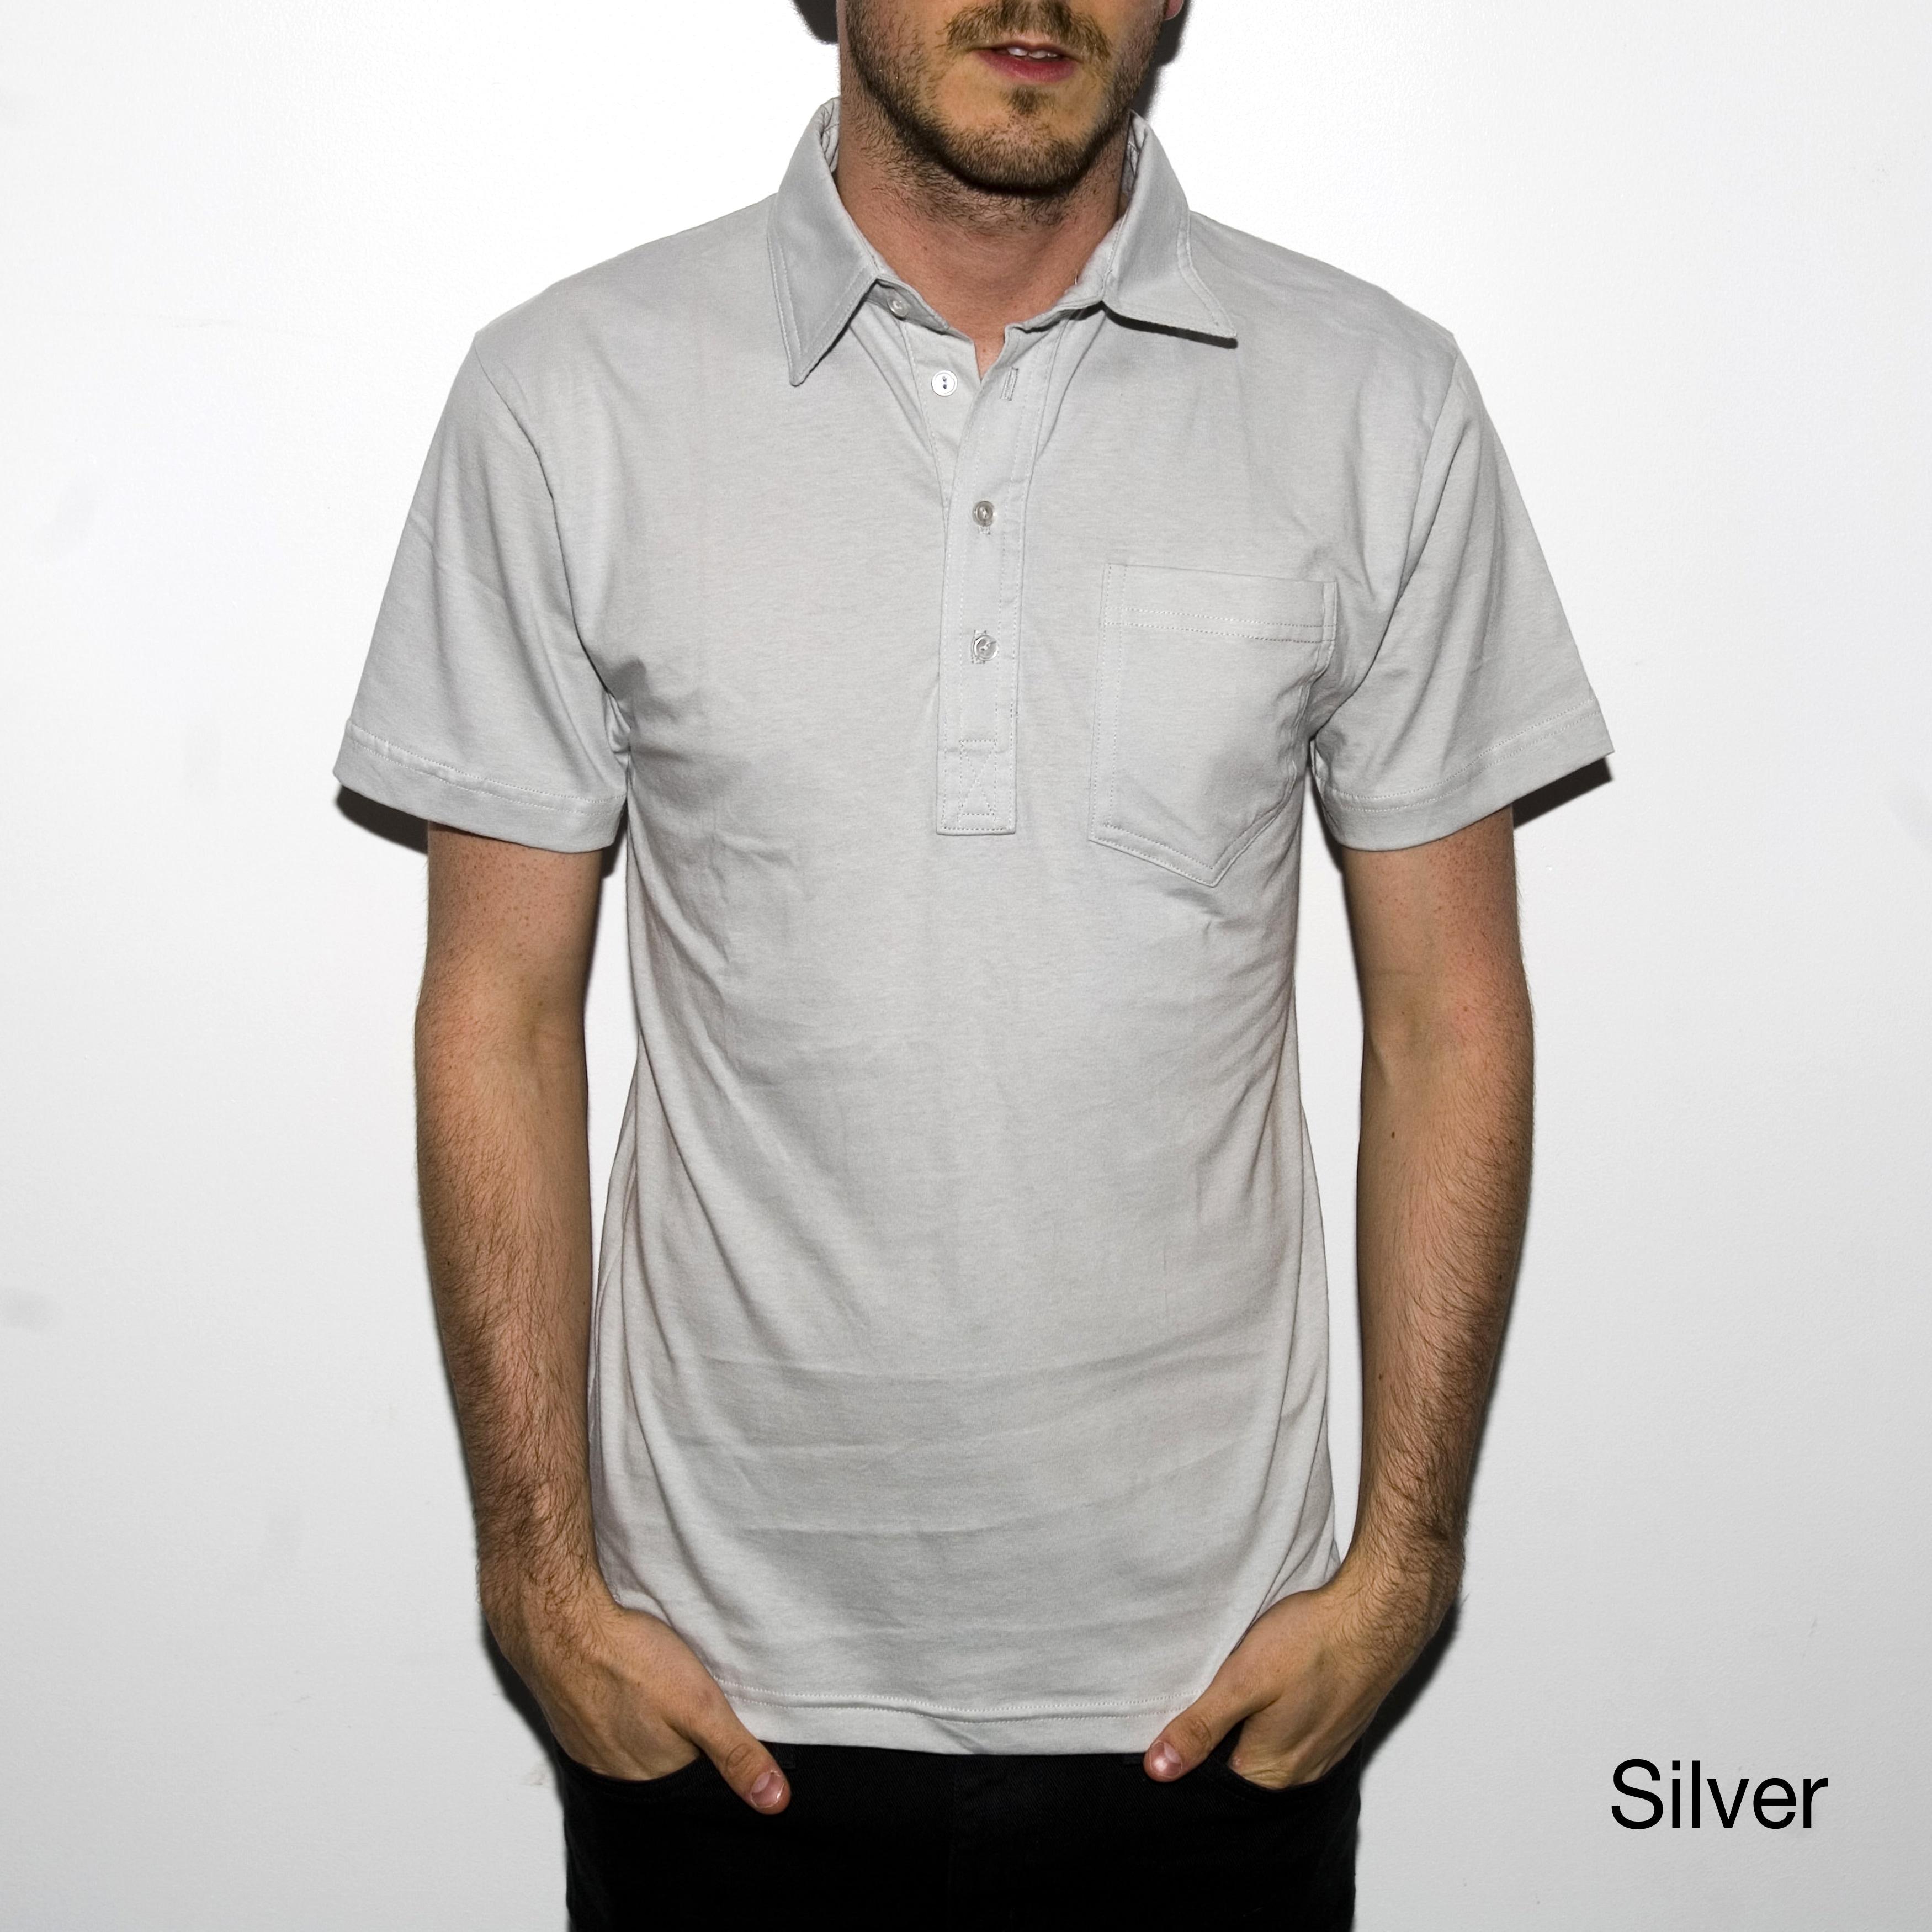 American Apparel Fine Jersey Short Sleeve Leisure Shirt Azərbaycan